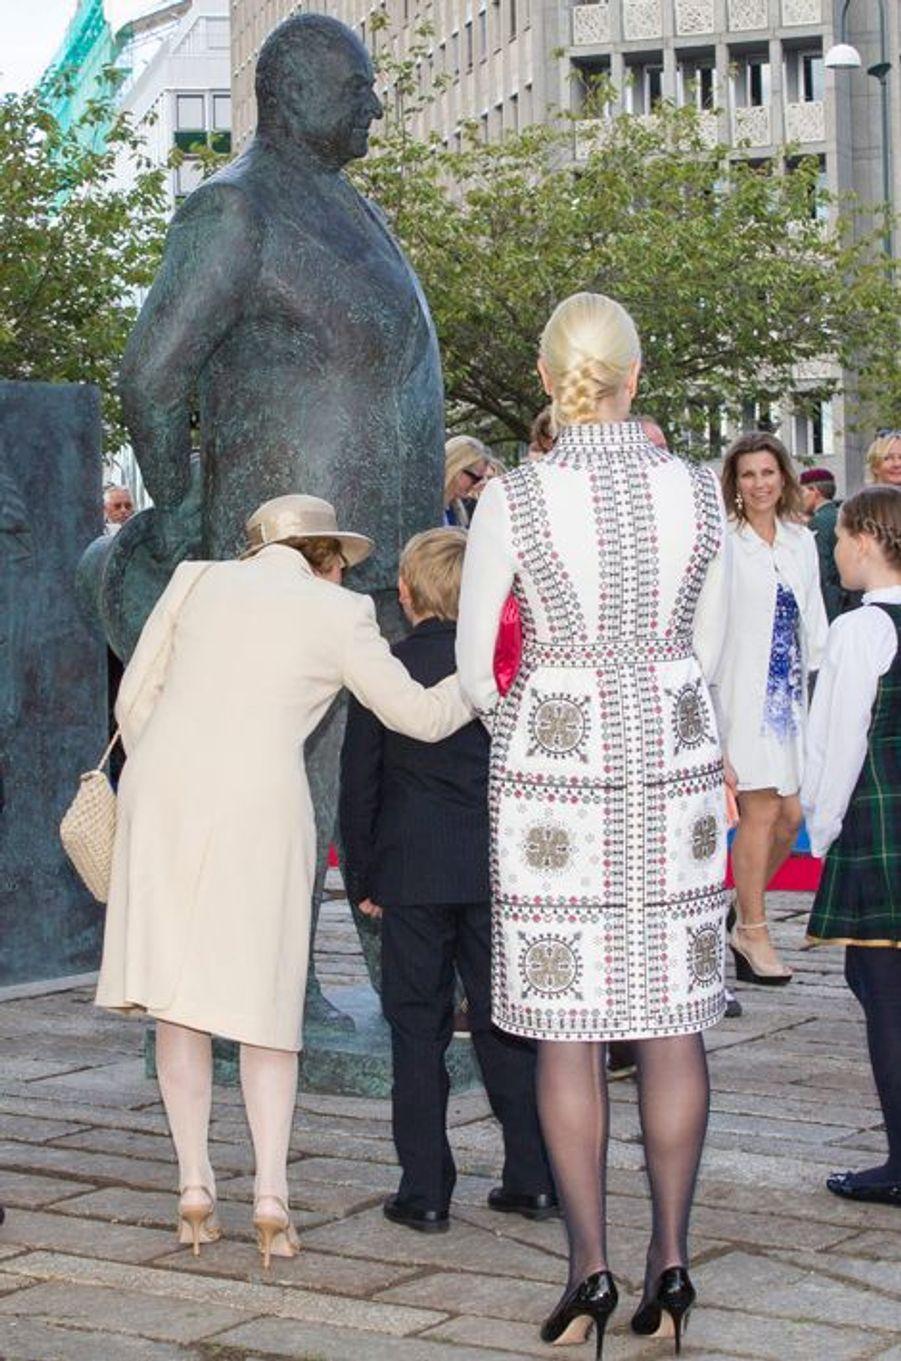 La reine Sonja et la princesse Mette-Marit de Norvège, à Oslo le 7 juin 2015